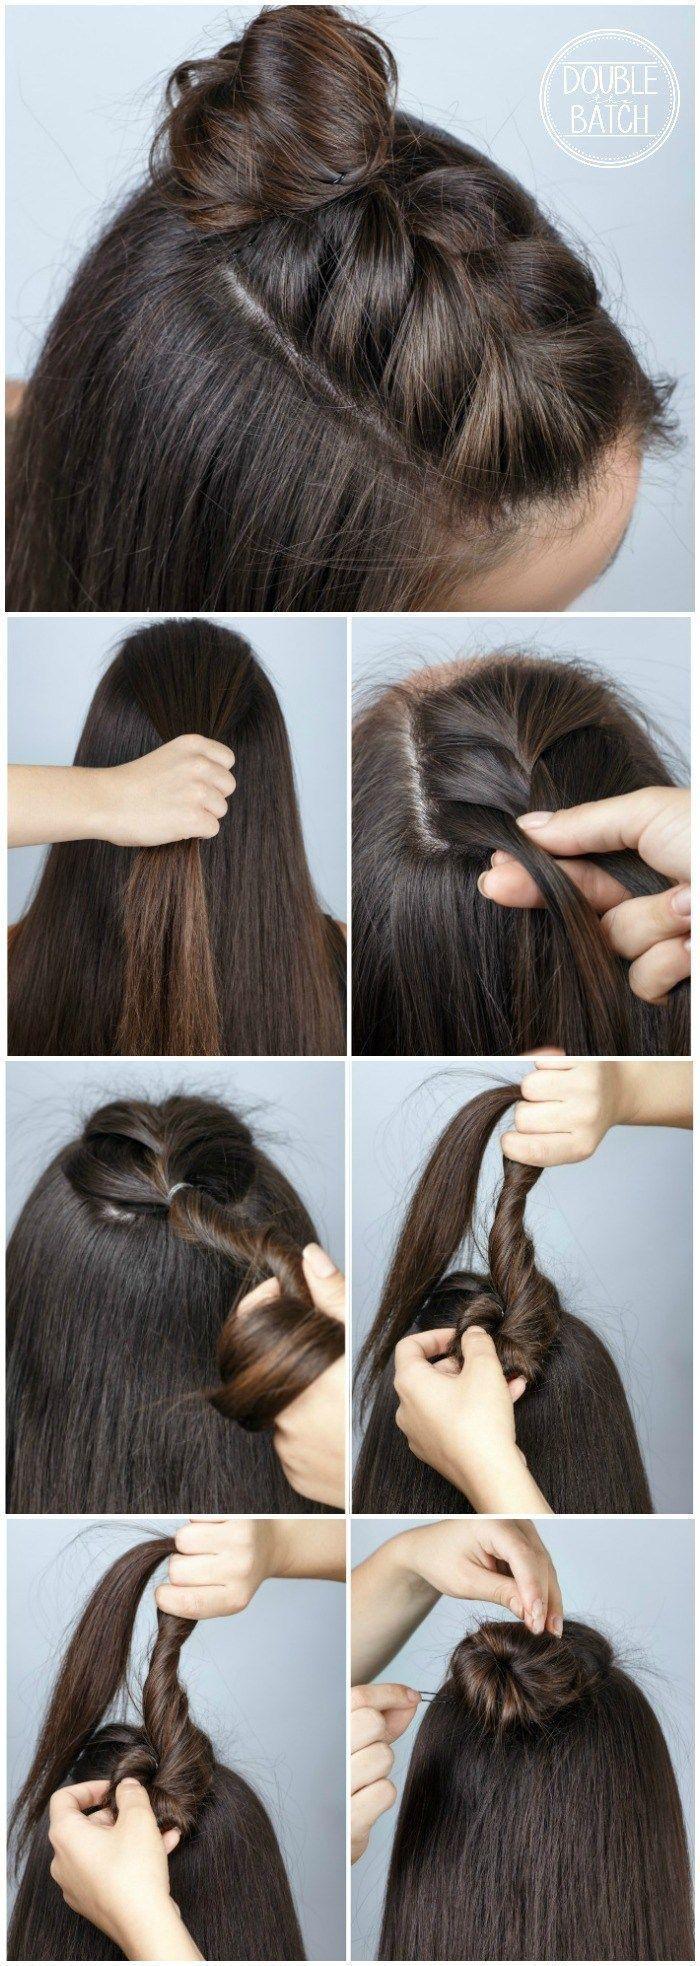 Easy hair ideas for school braid bun hair pinterest easy